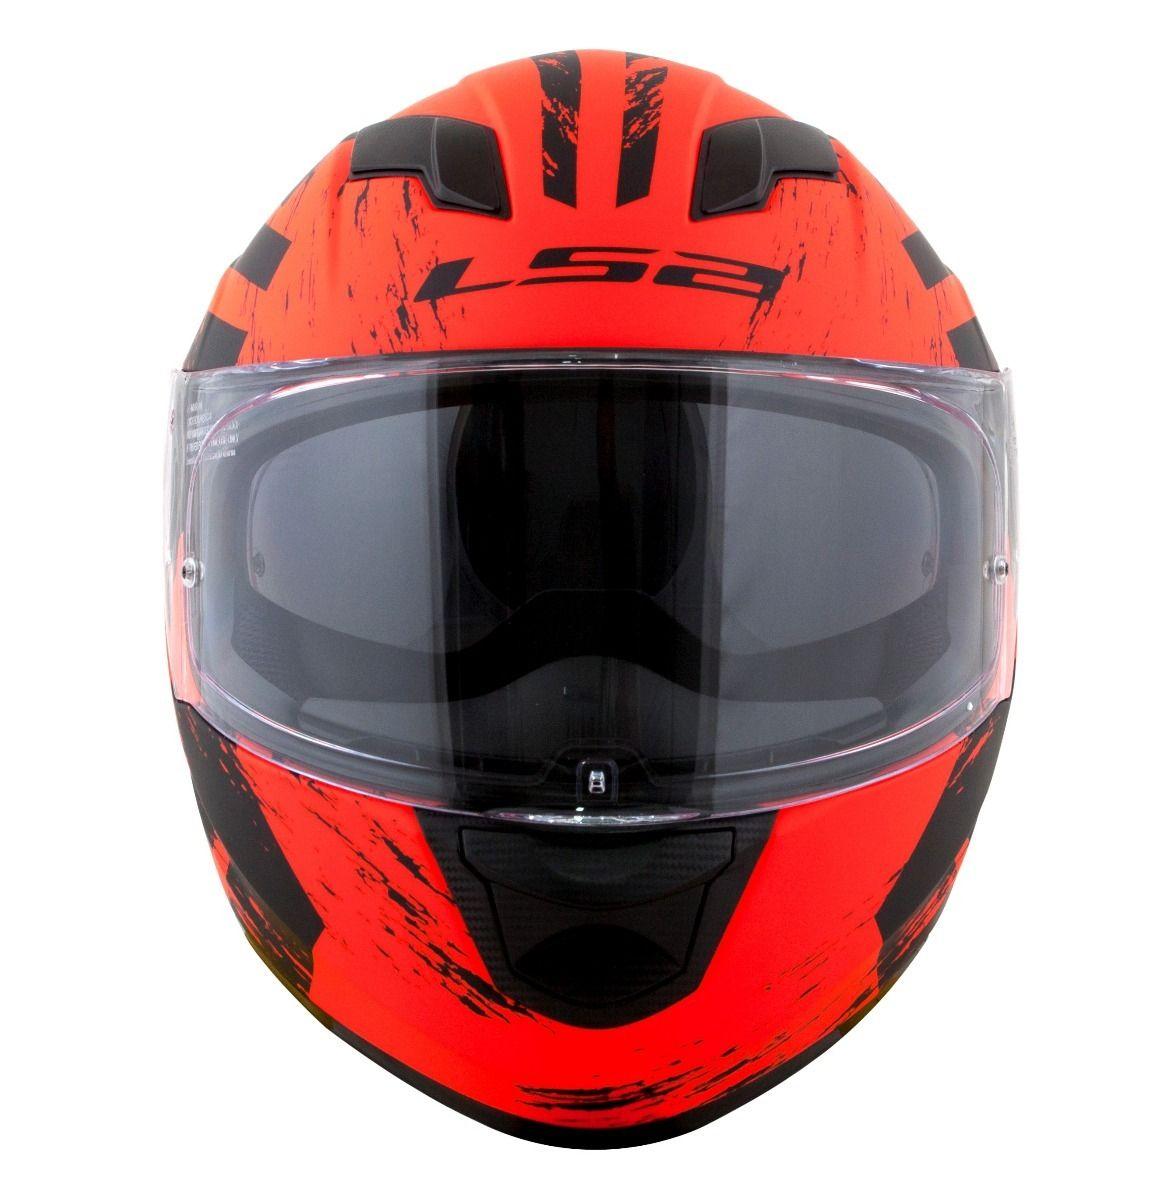 Capacete LS2  FF320 Hunter (C/ VISEIRA SOLAR) Laranja  - Nova Centro Boutique Roupas para Motociclistas